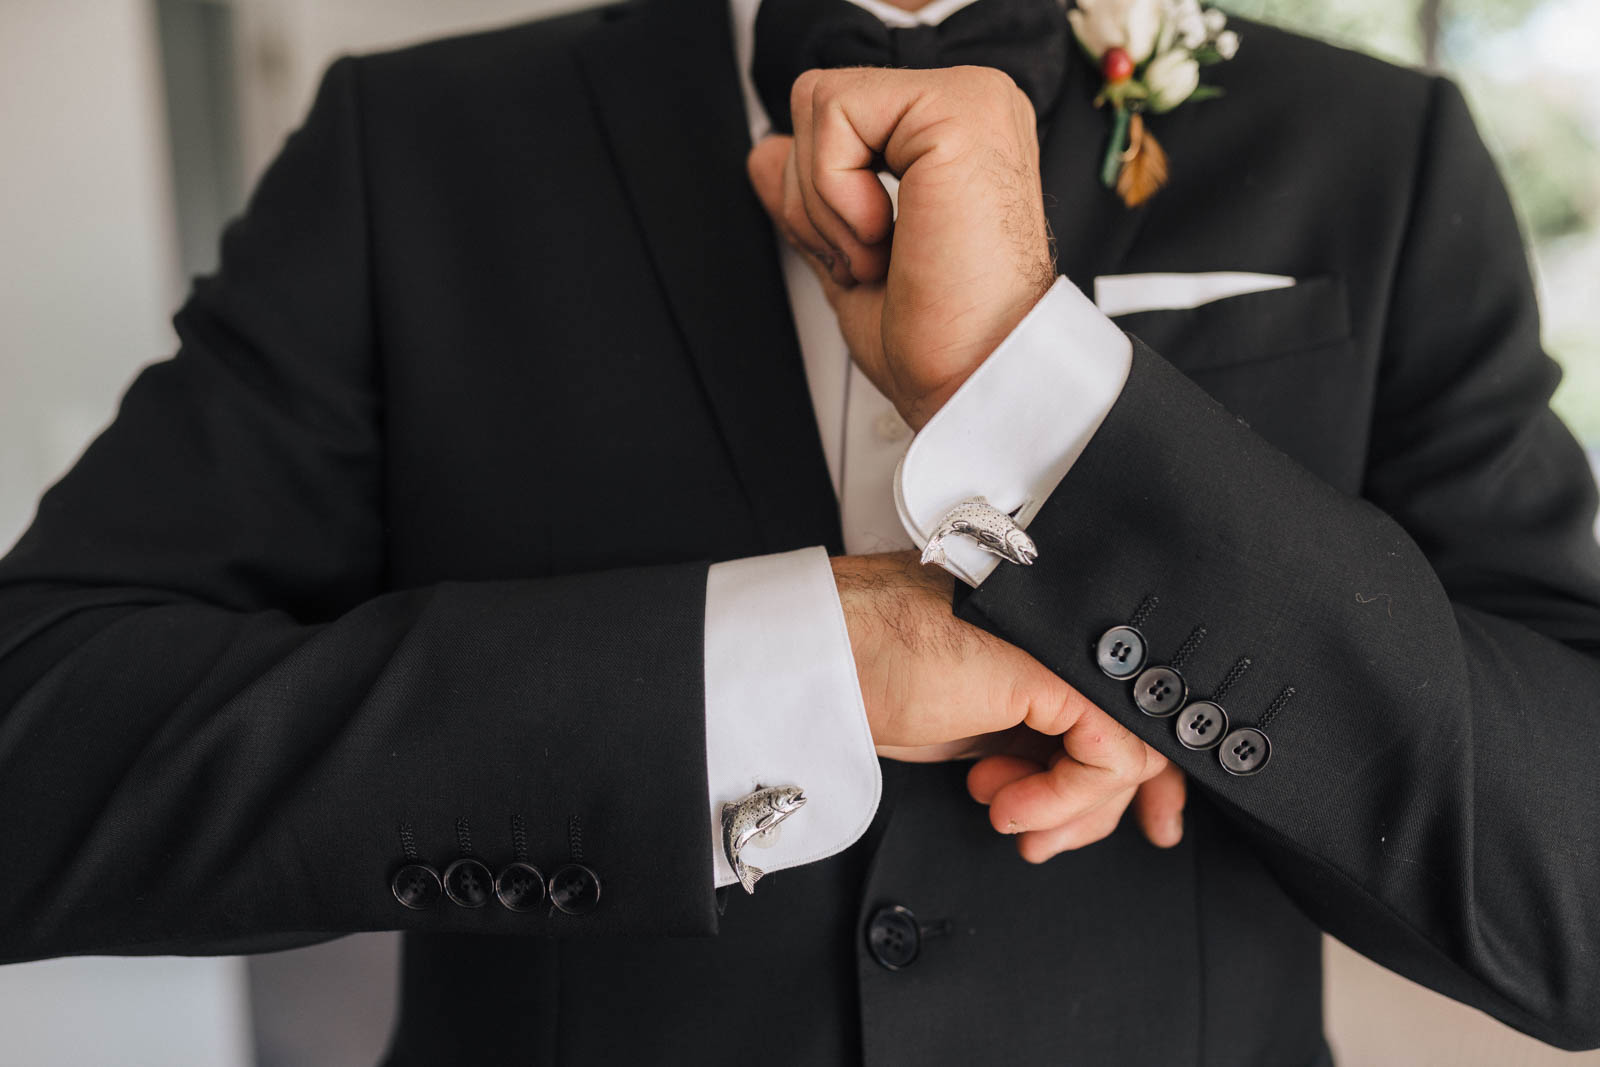 newfound-s-p-mt-maunganui-tauranga-wedding-photographer-1347-LQ109348